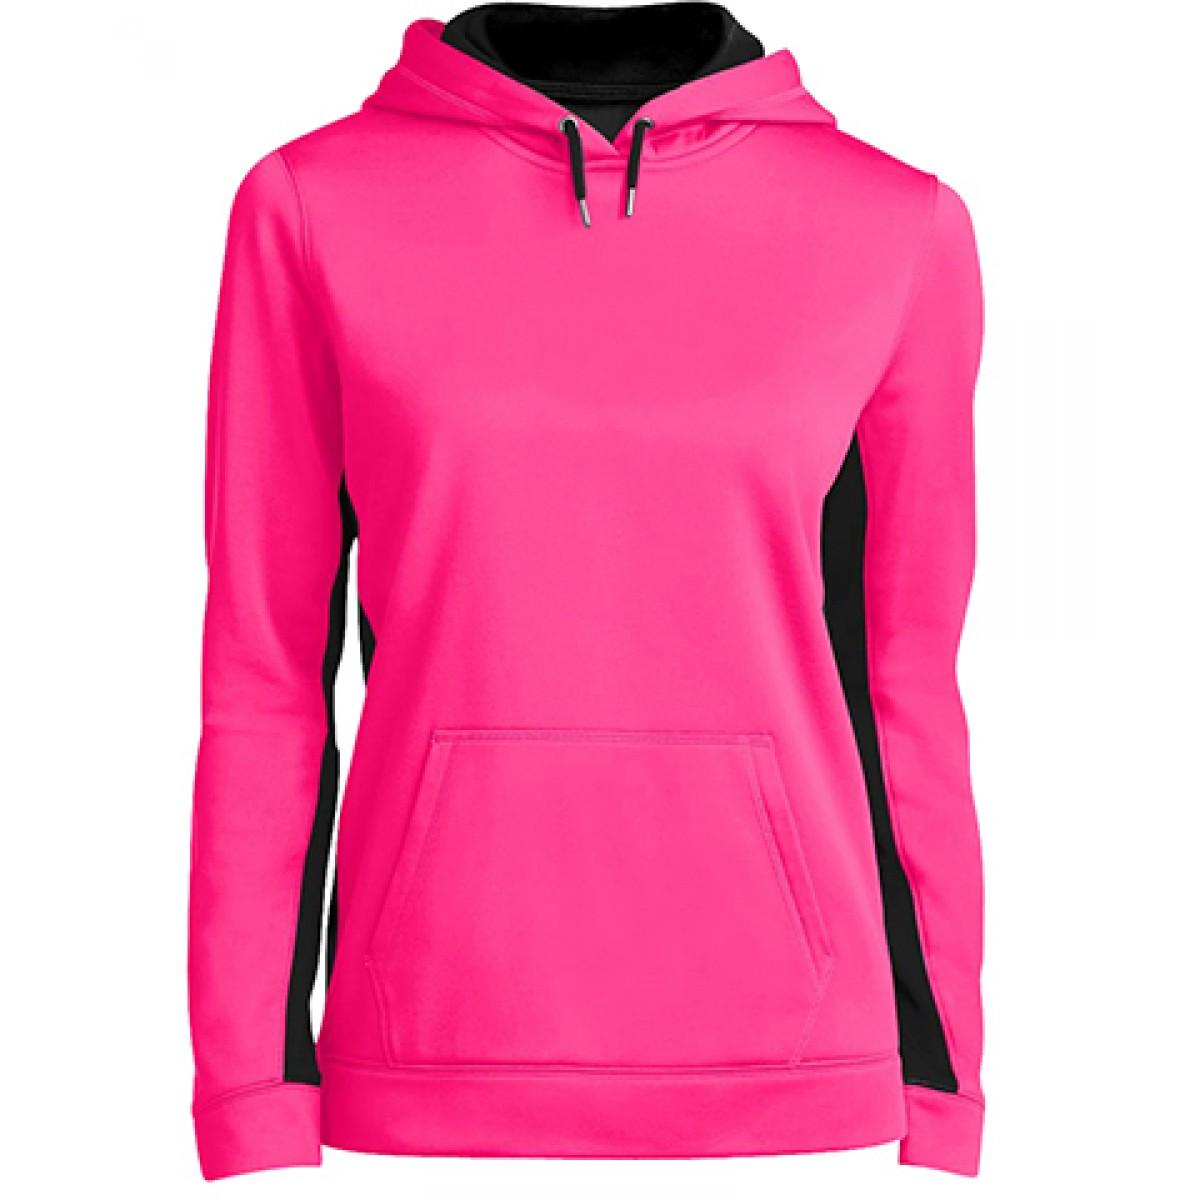 Ladies Colorblock Hooded Pullover-Neon Pink Black-XL